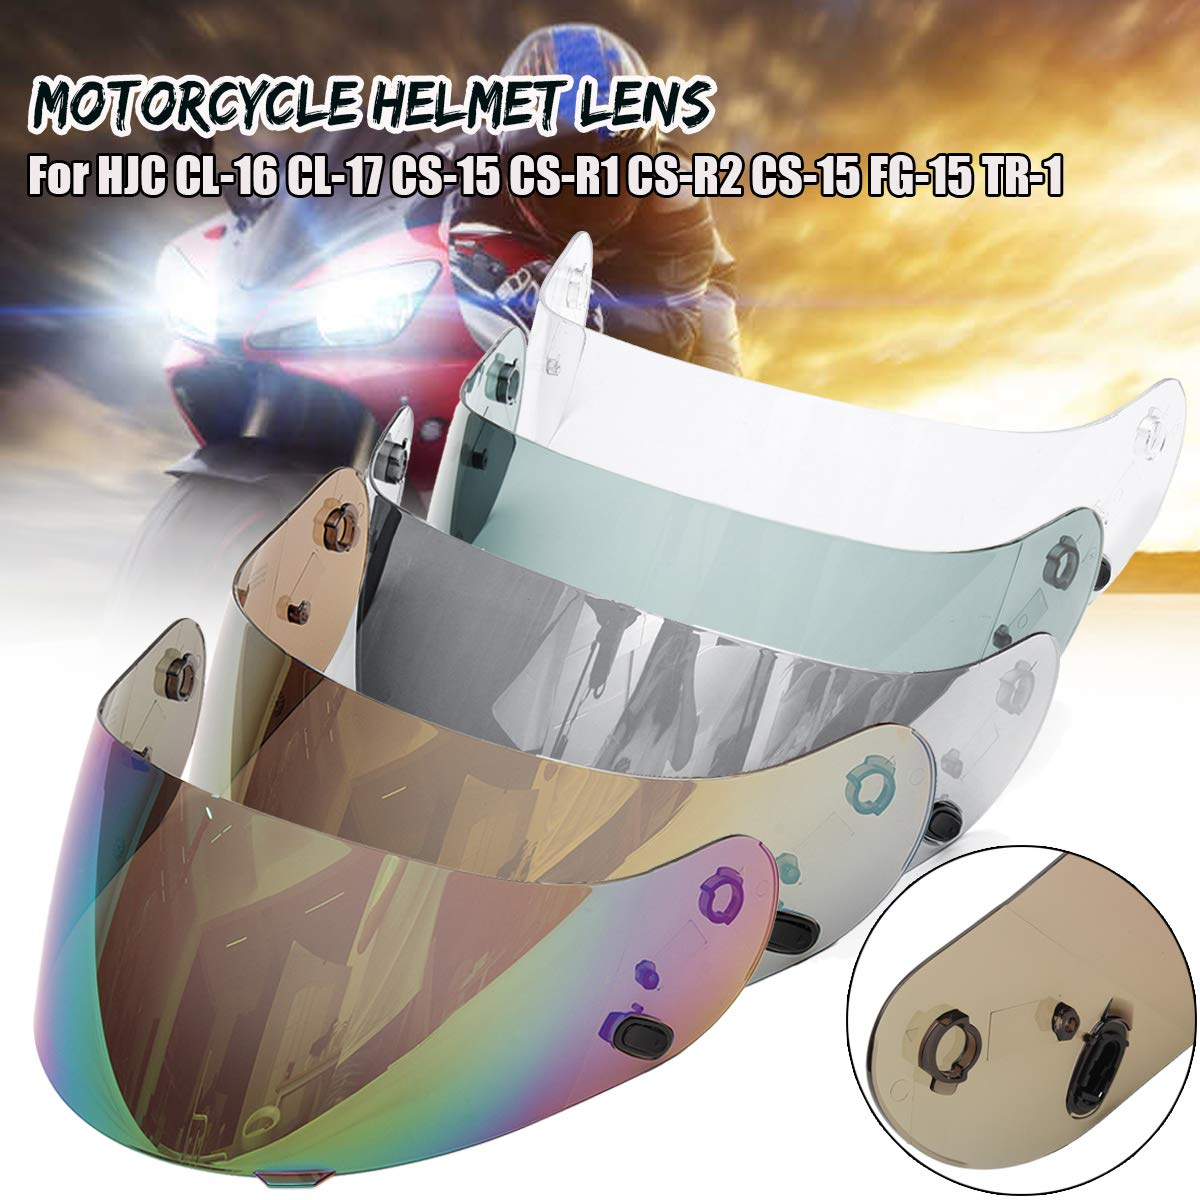 Visera protectora para lente de casco de motocicleta para HJC CL-16 CL-17 CS-15 CS-R1 CS-R2 CS-15